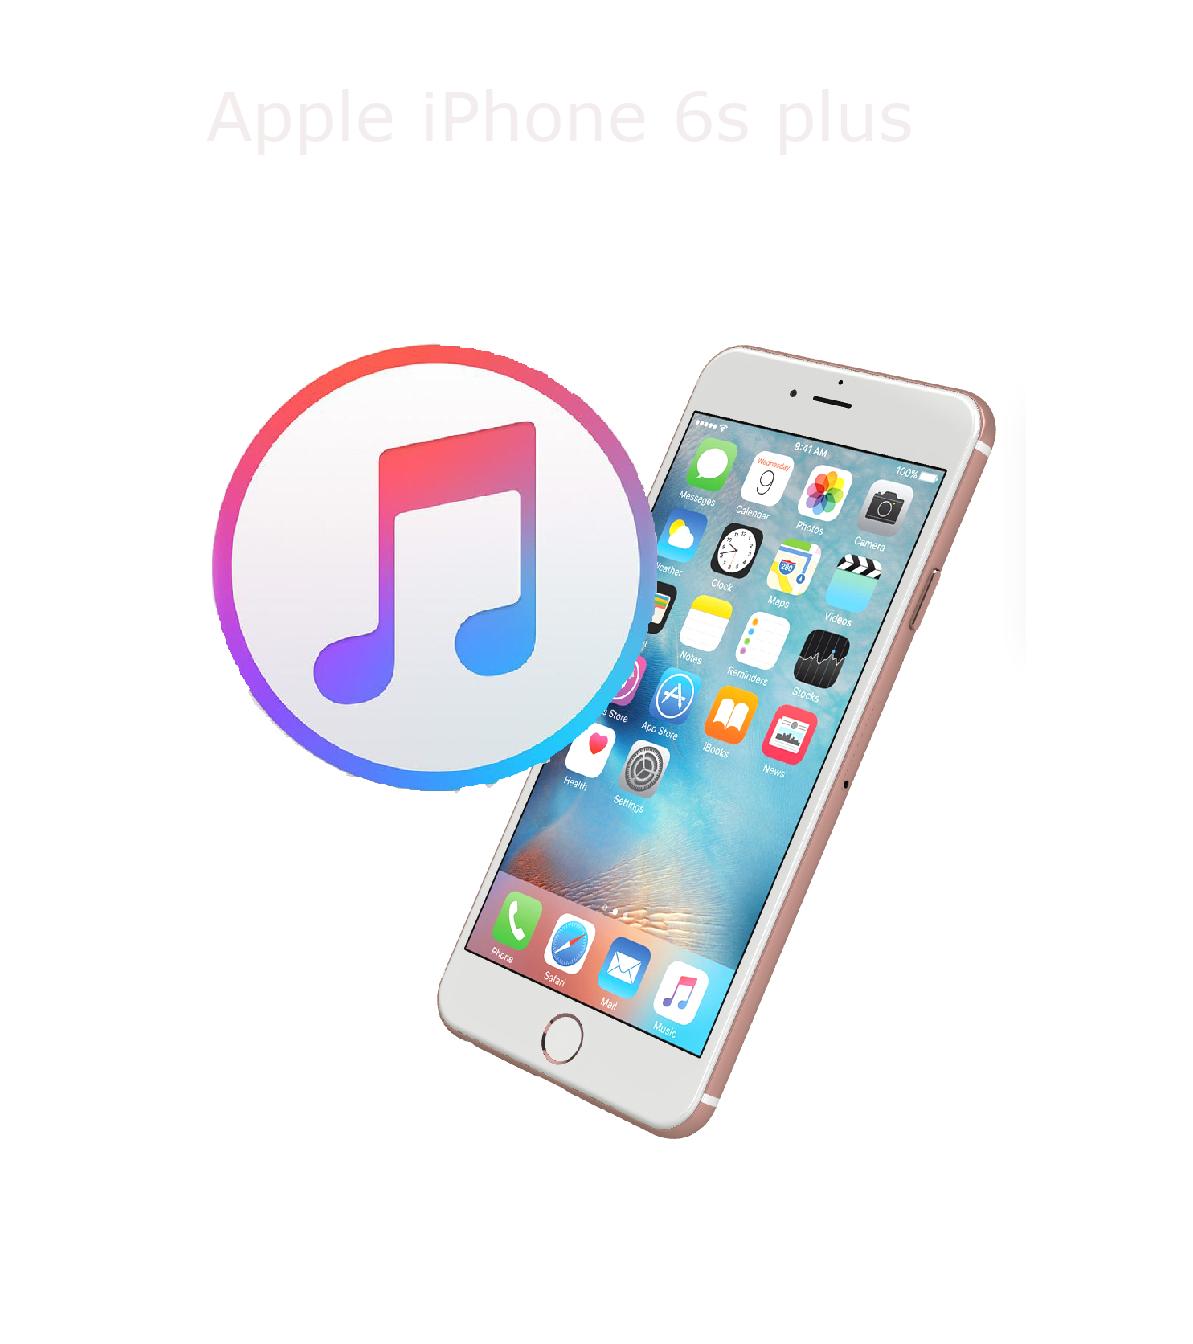 Mjukvara/Återställning iPhone 6s plus